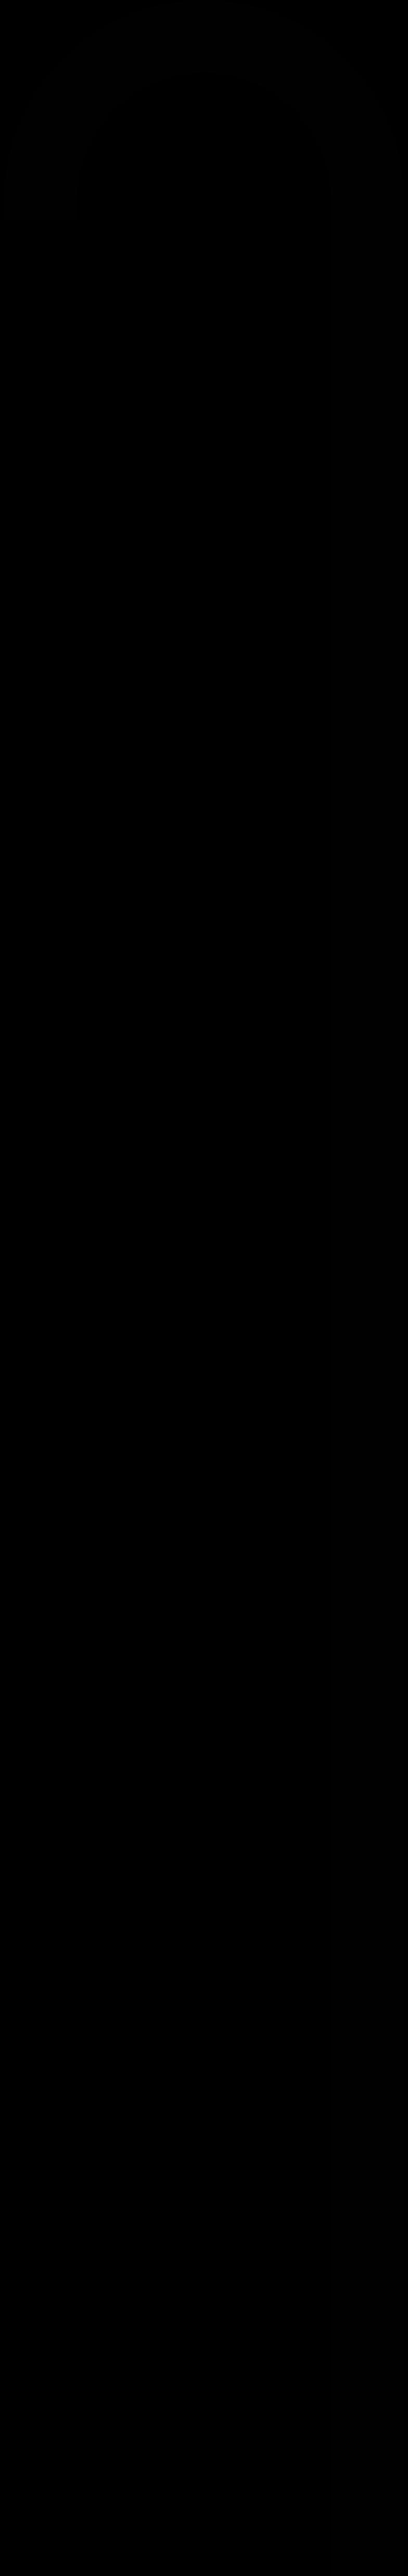 walking stick Clipart illustration in PNG, SVG